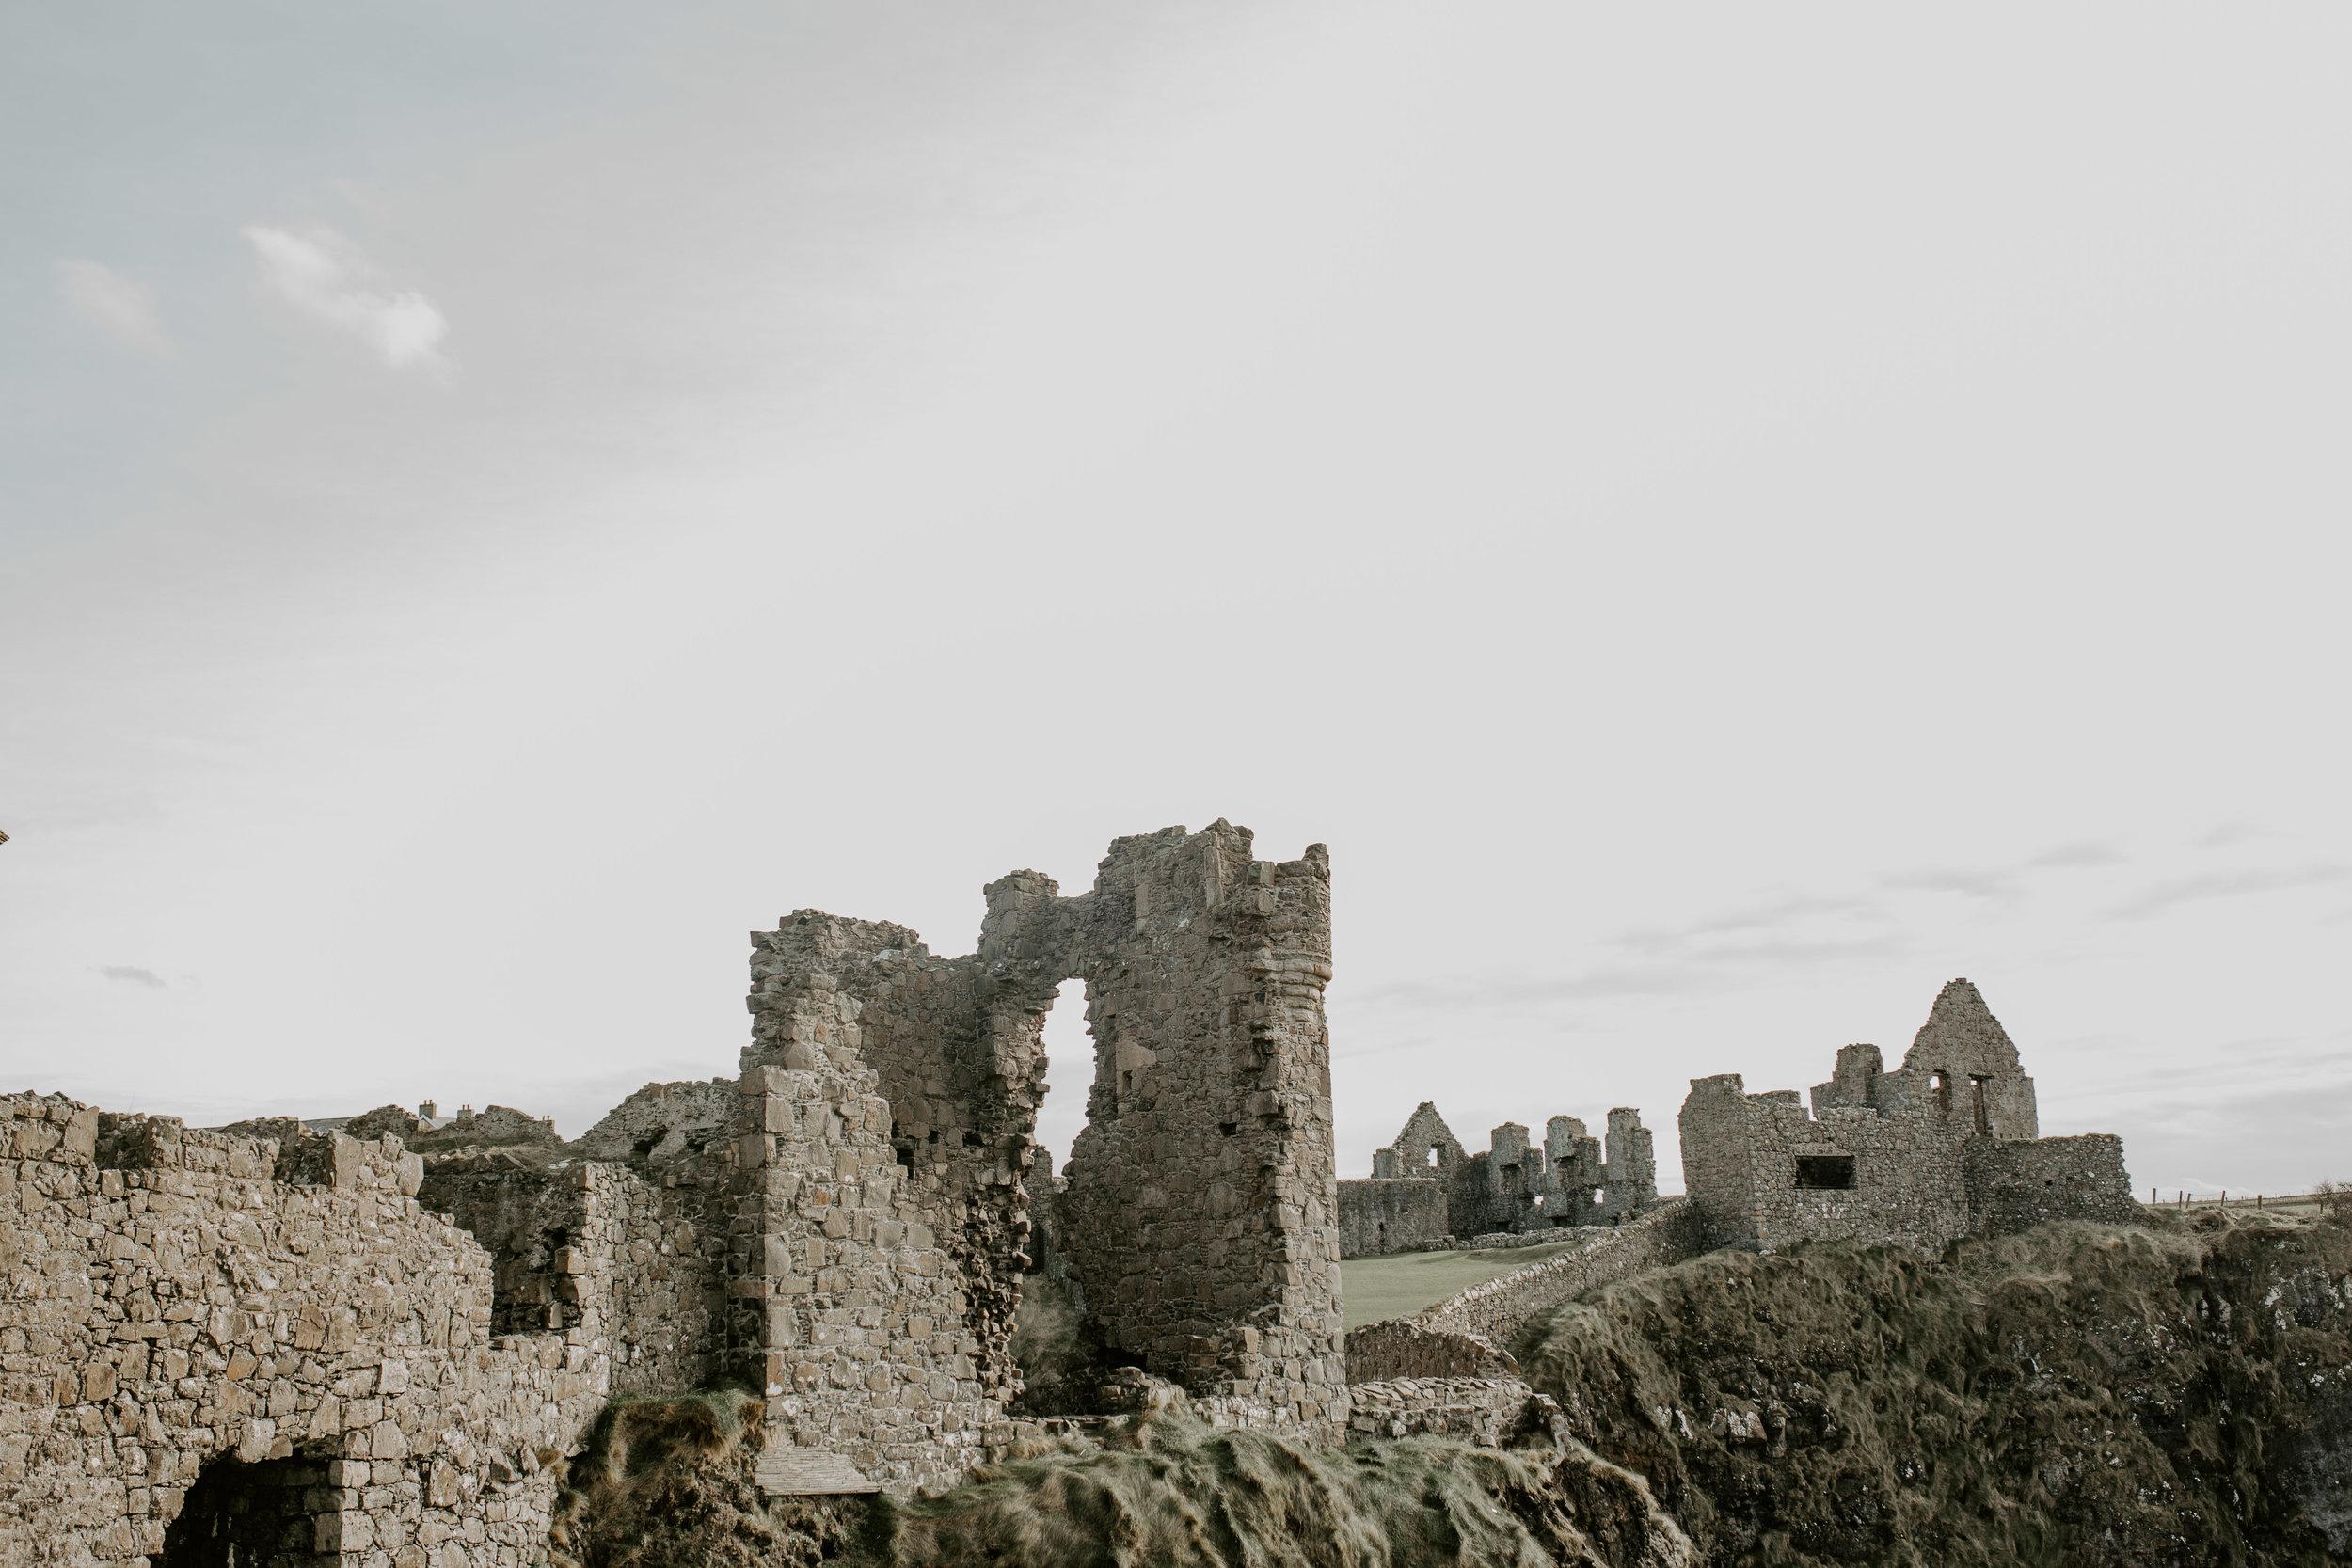 nicole-daacke-photography-ireland-destination-elopement-wedding-photographer-destination-wedding-irish-castle-wedding-intimate-ireland-wedding-photographer-ireland-elopement-photographer-dublin-howth-belfast-antrim-destination-wedding-photos-47.jpg